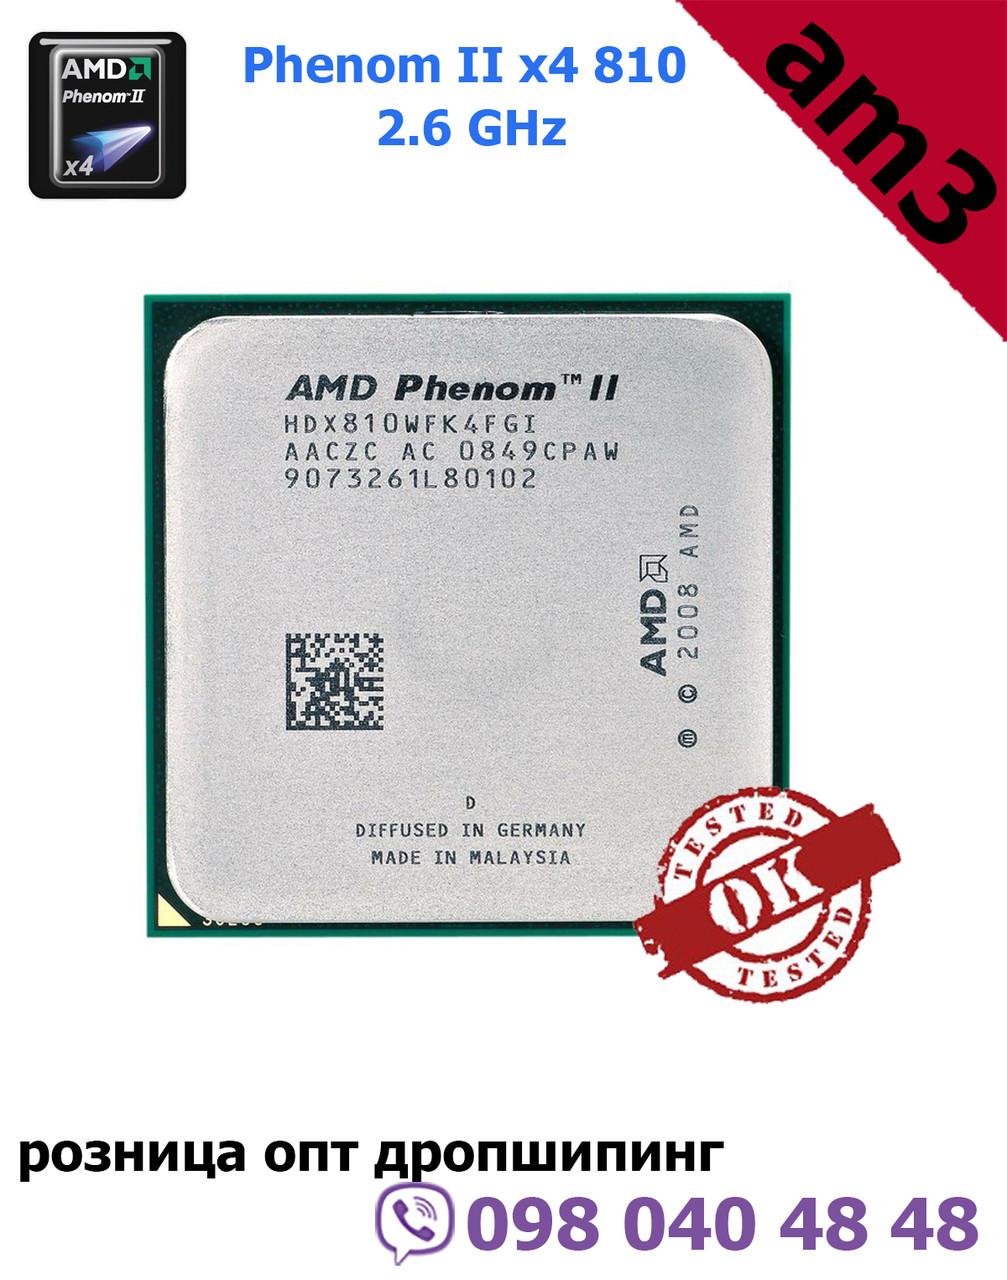 Процессор AMD Phenom II X4 810, 4 ядра, 2.6 ГГц, AM3